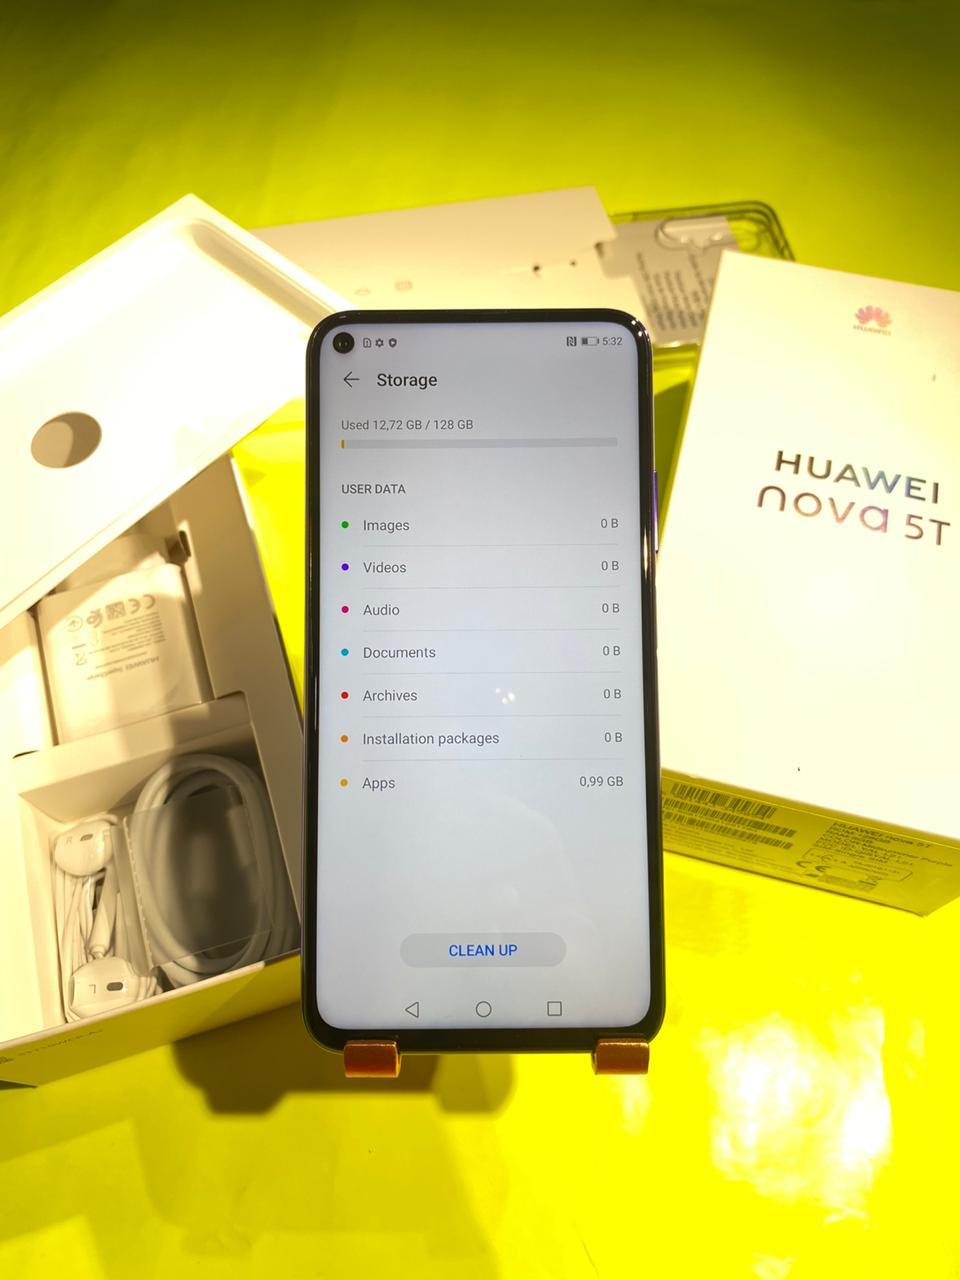 Huawei Nova 5T 128GB